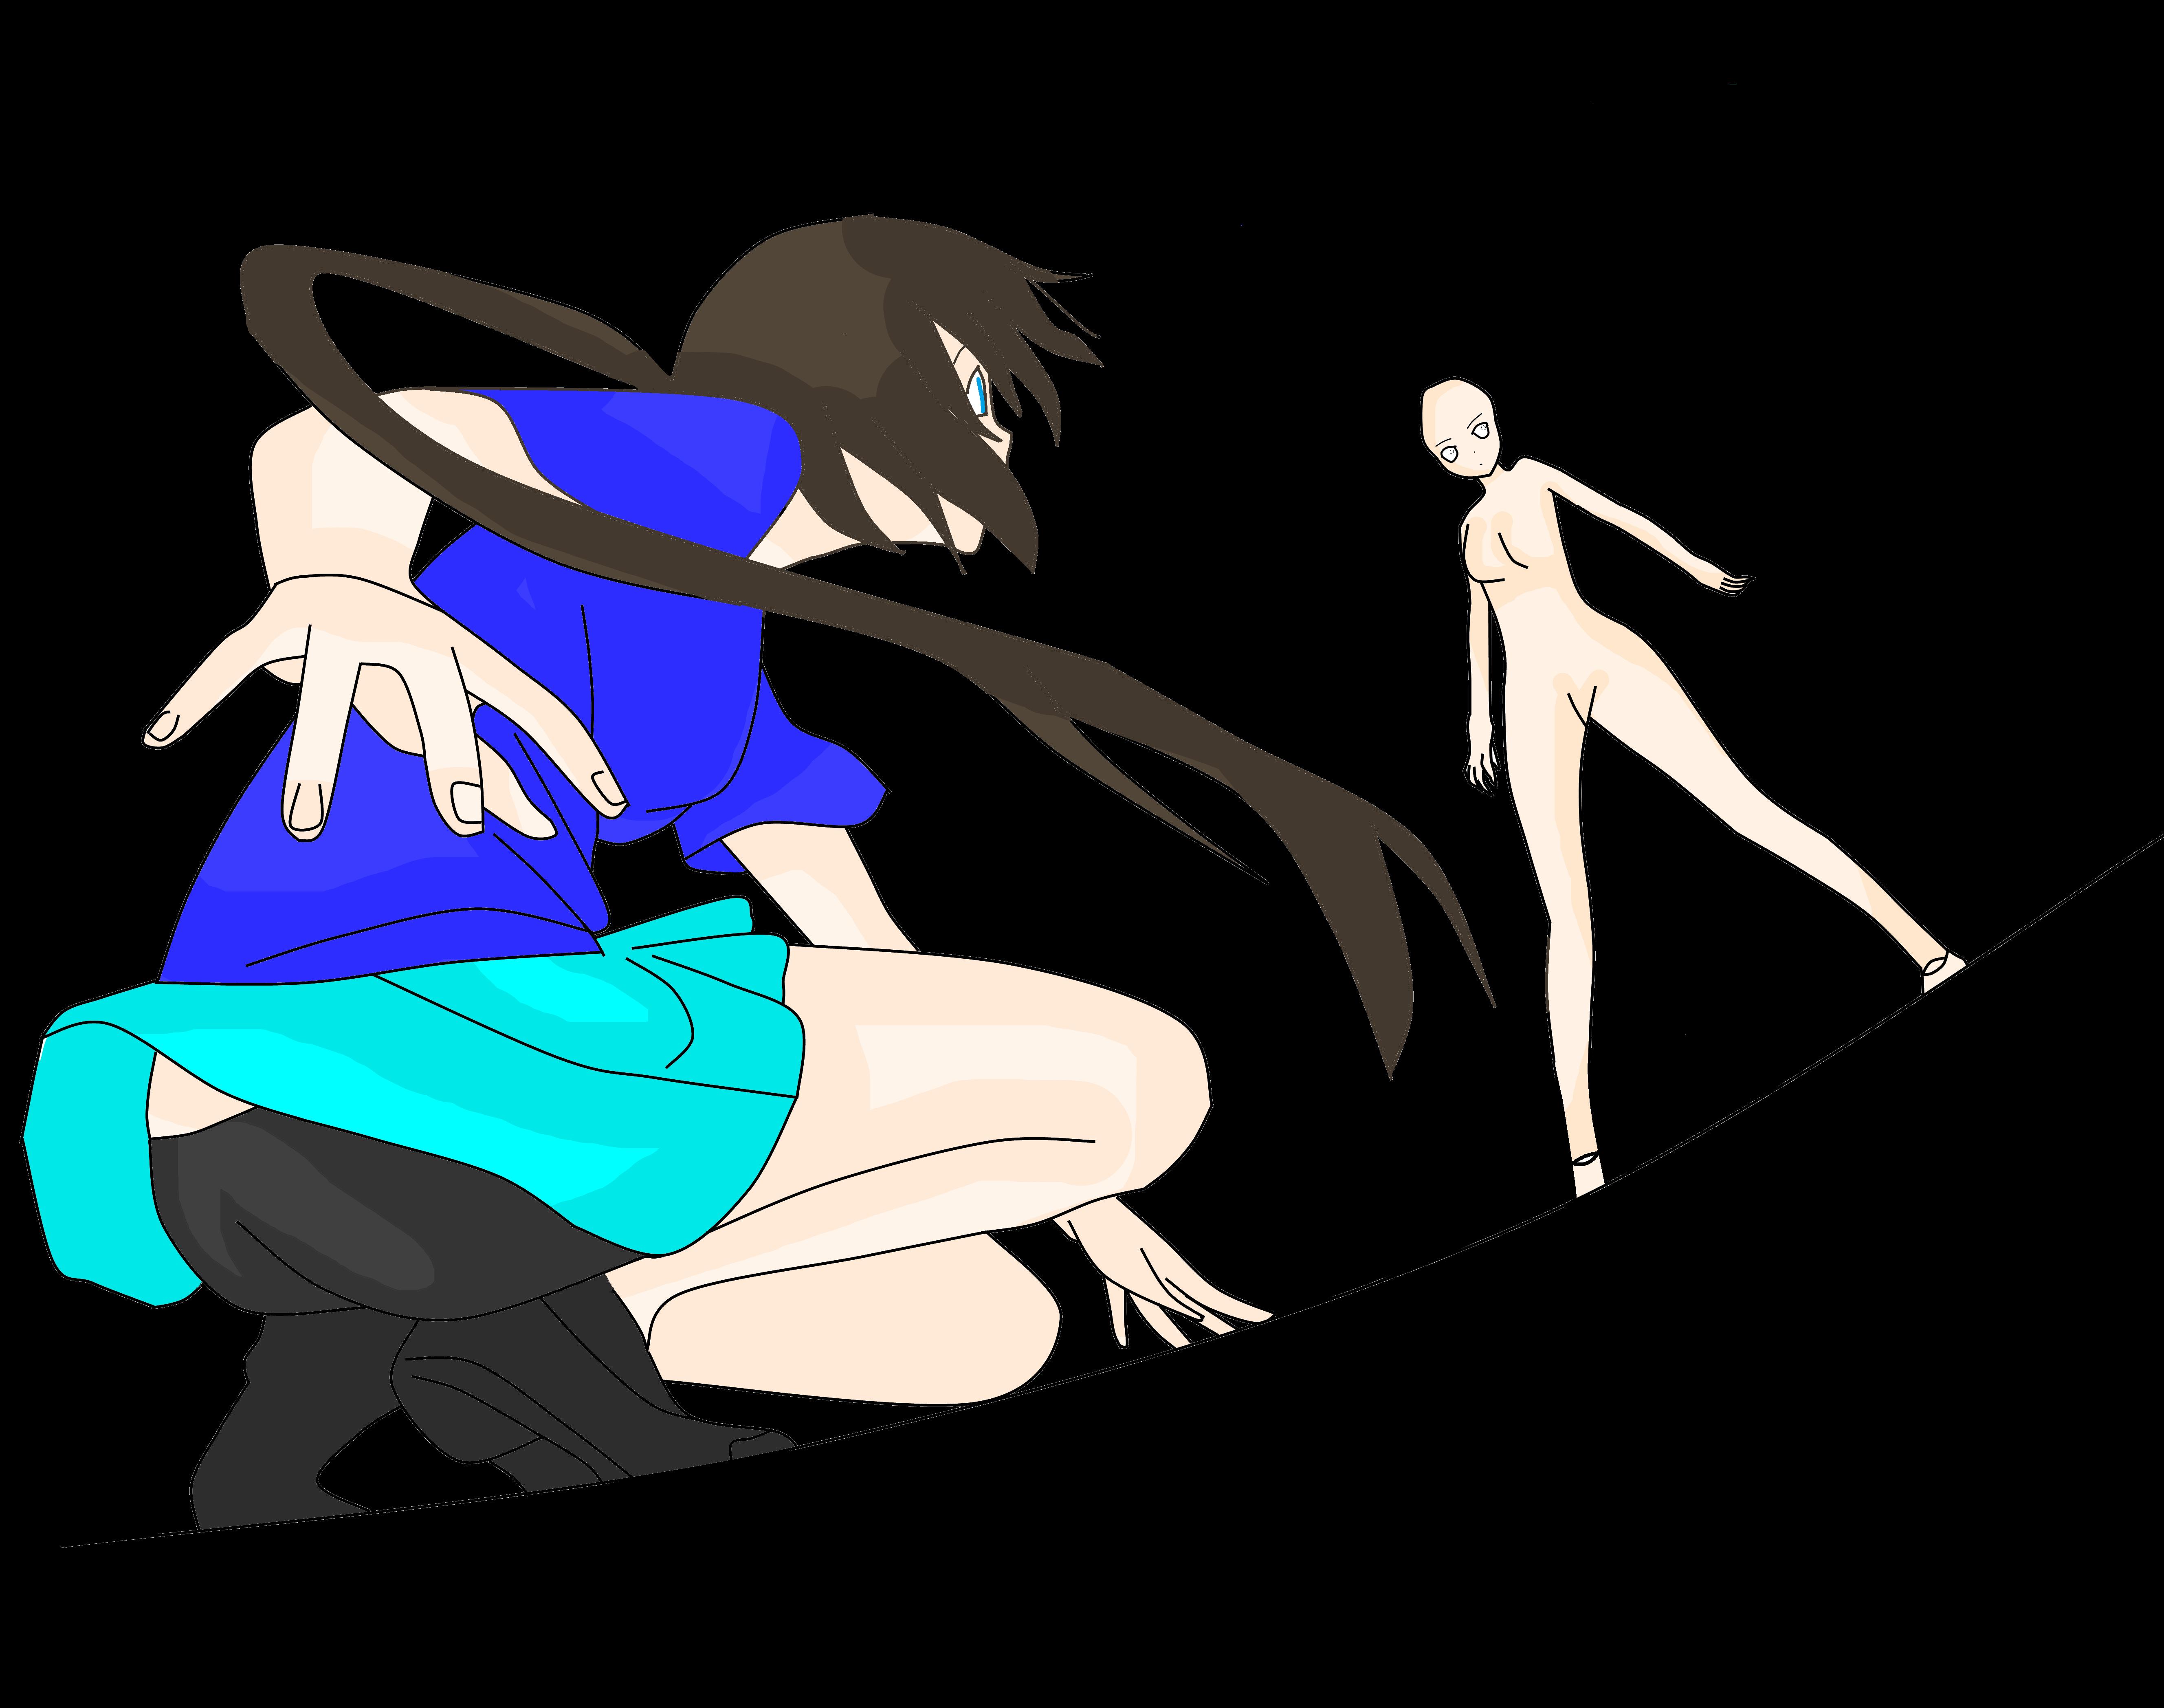 :.Collab.: fight with Saraeia by Saraeia on DeviantArt